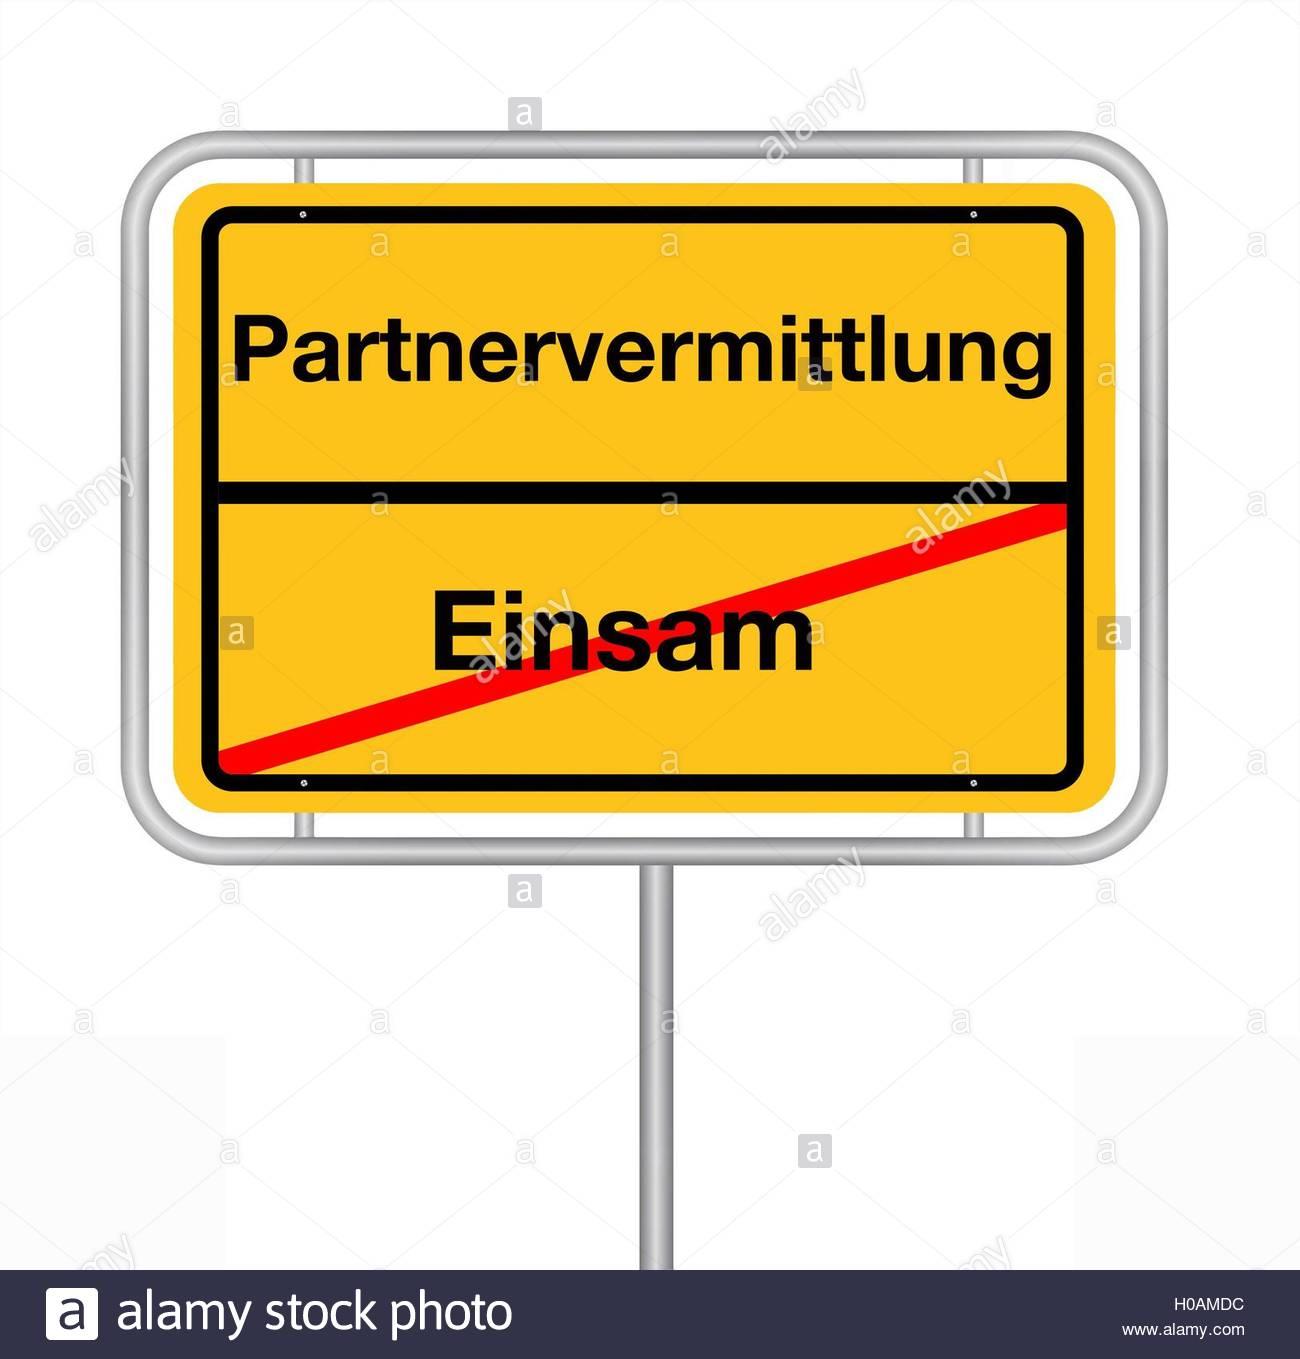 Partnervermittlung black and white